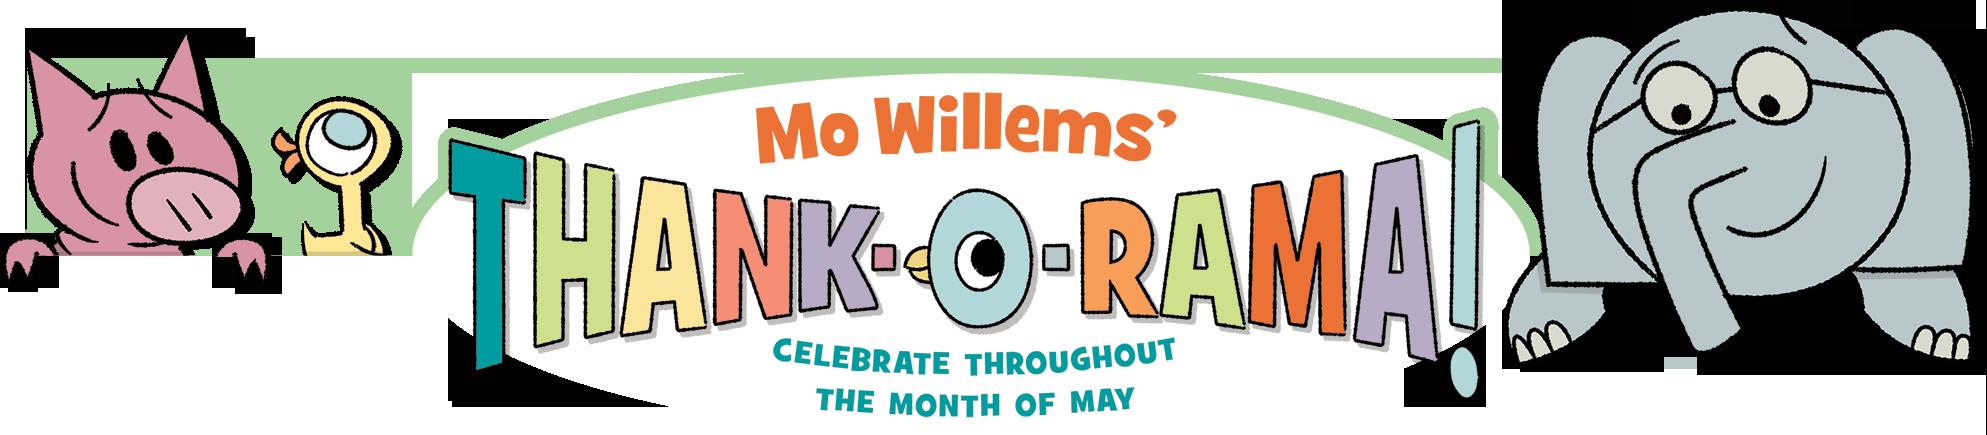 Mo Willems Thankorama